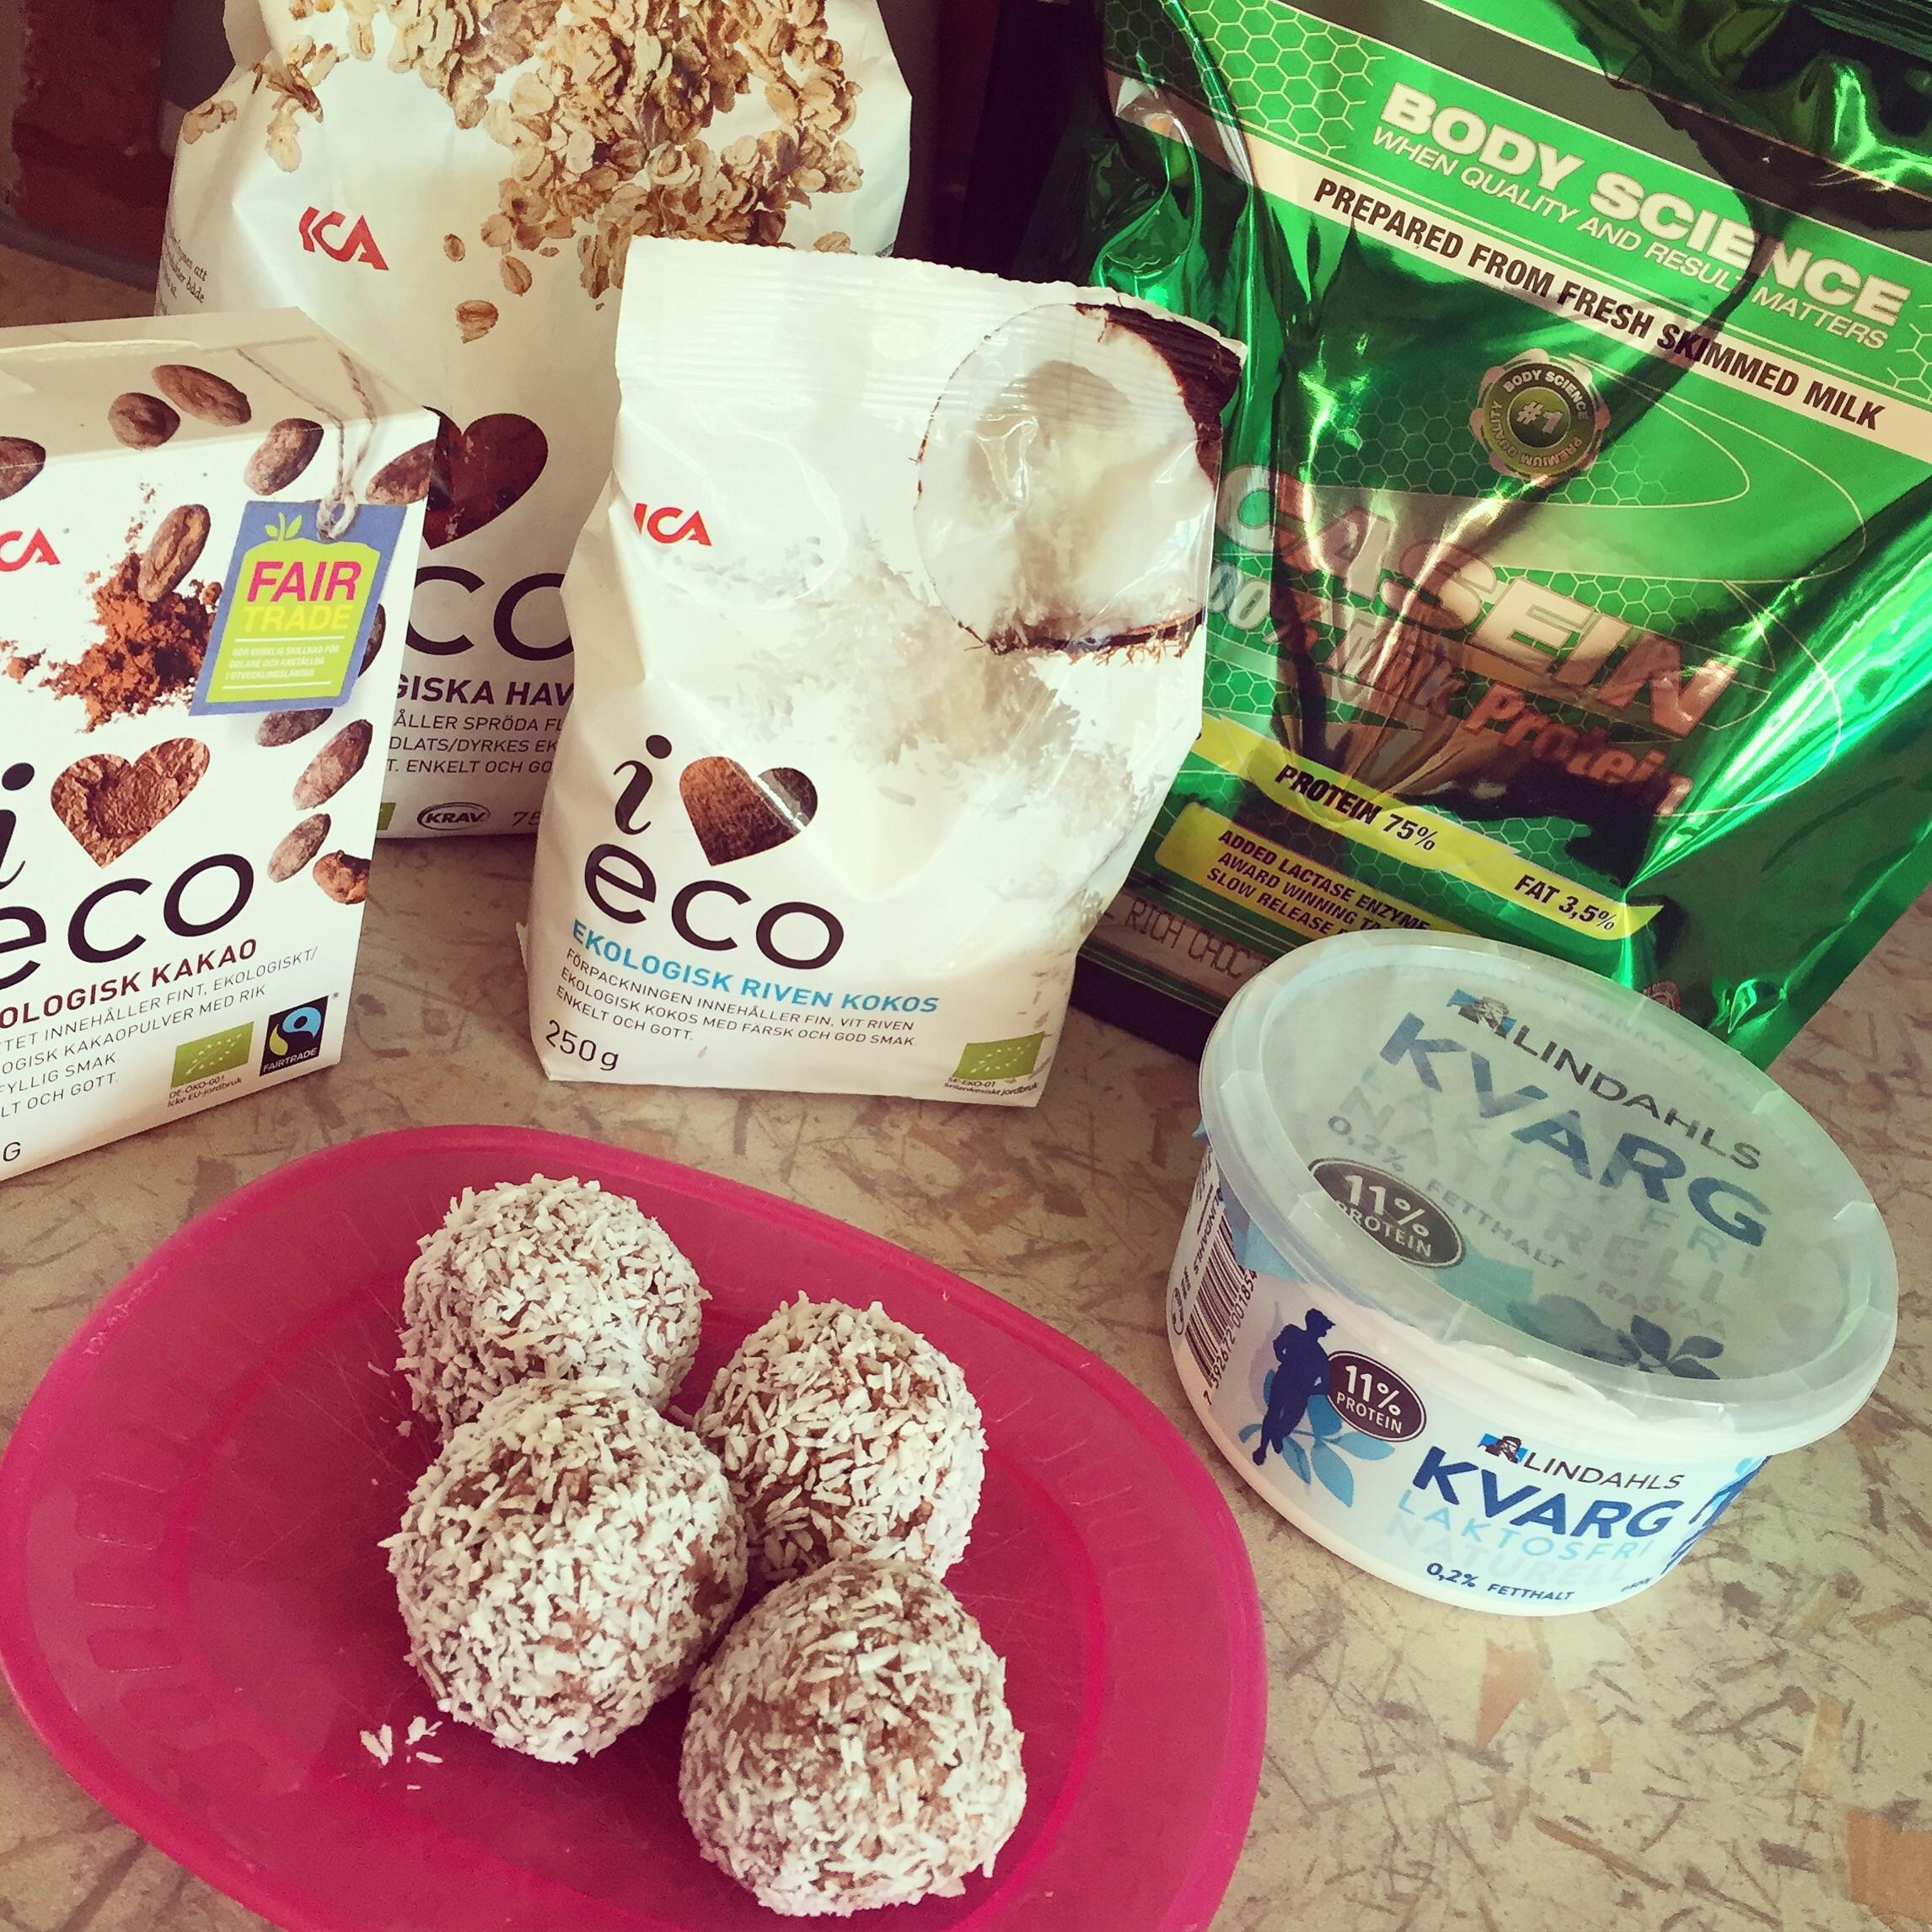 nyttiga chokladbollar proteinpulver